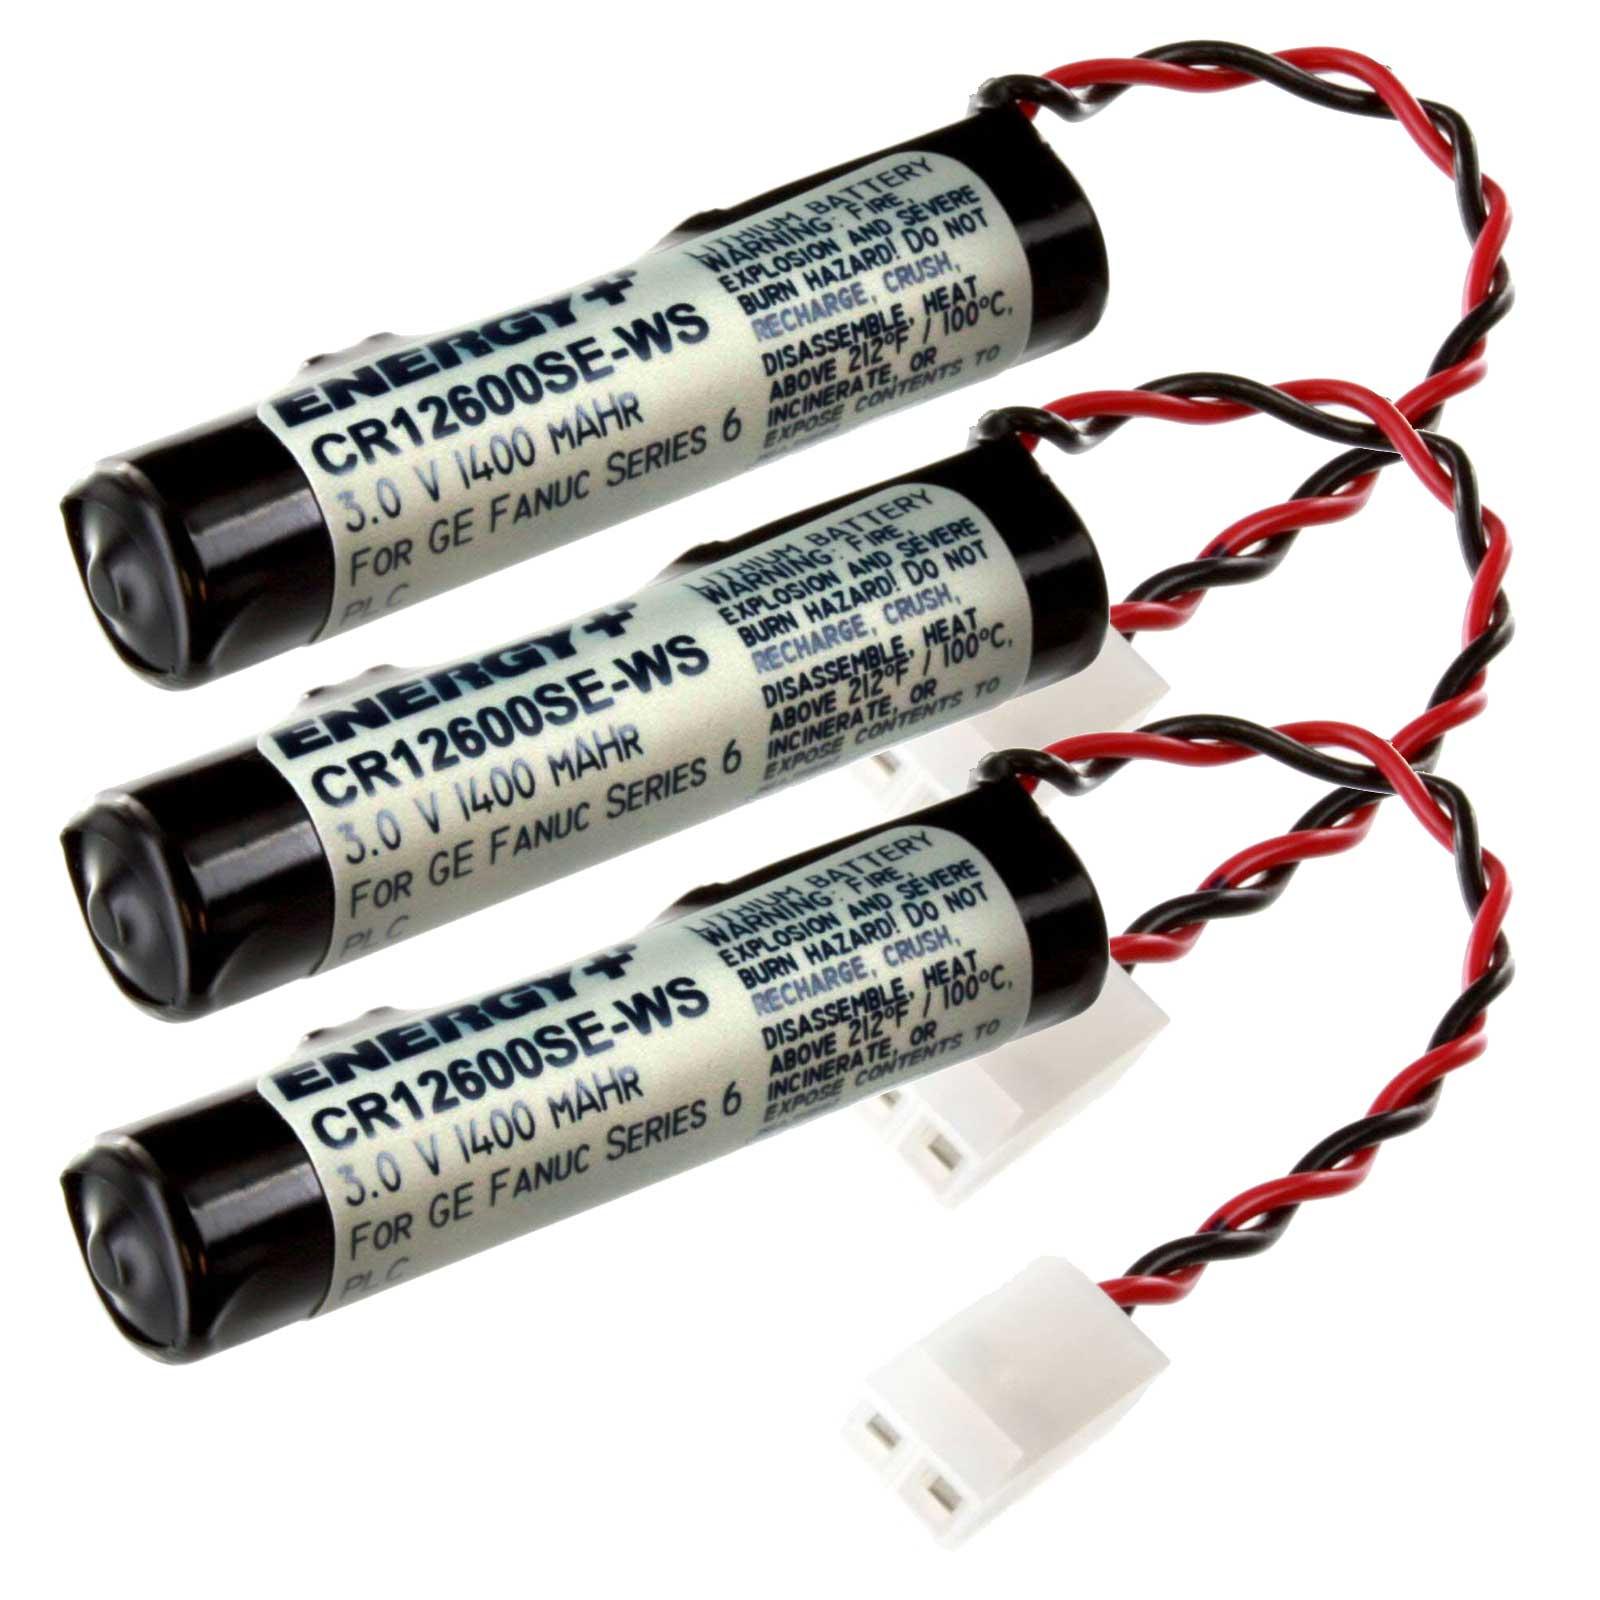 Computer Batteries For Ge Fanuc 90-20 90-30 Series Newark 94C0433 FAST USA SHIP